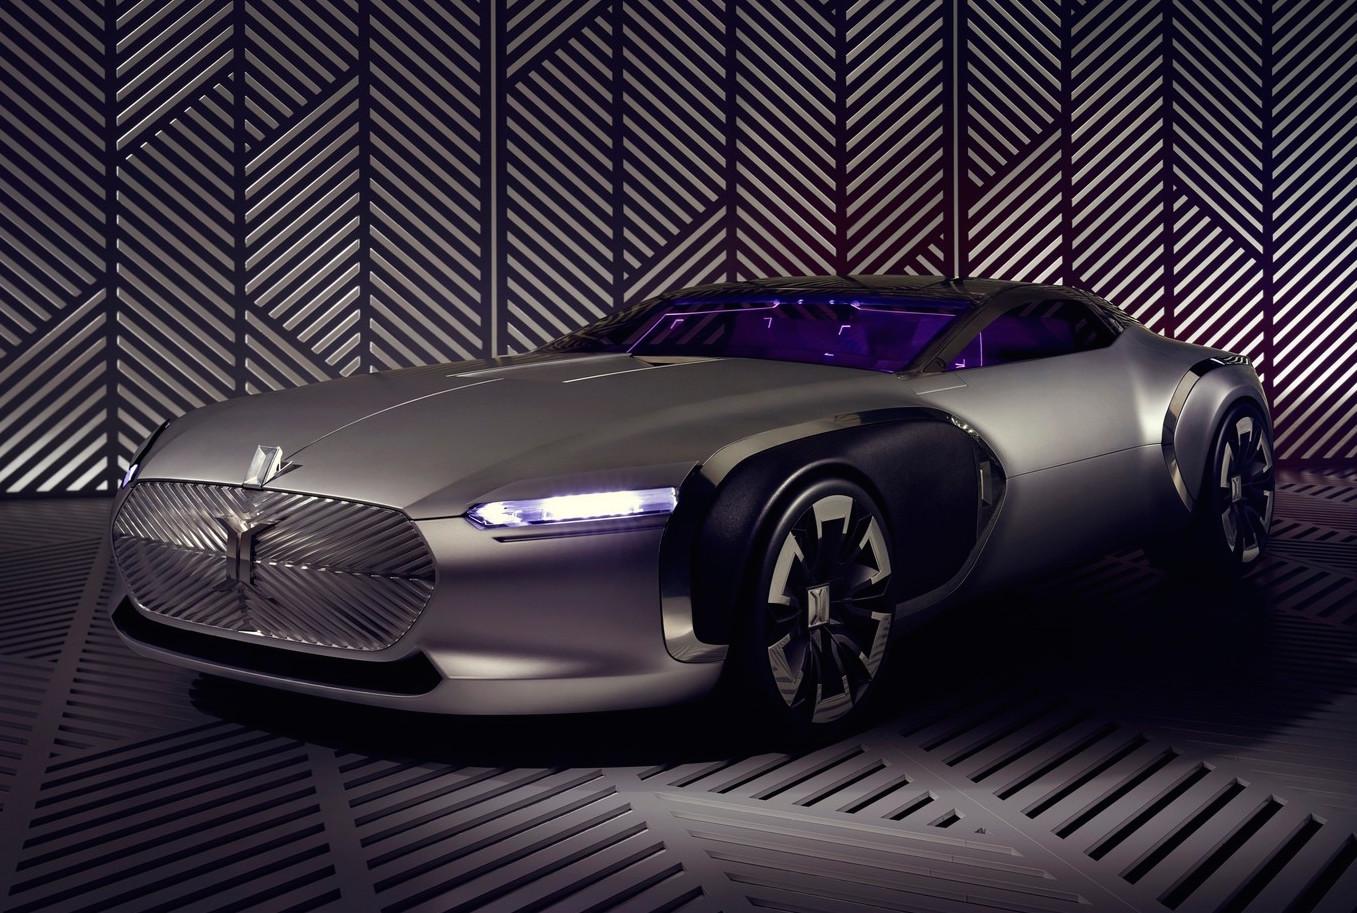 renault coupe corbusier concept unveiled tribute to le corbusier performancedrive. Black Bedroom Furniture Sets. Home Design Ideas